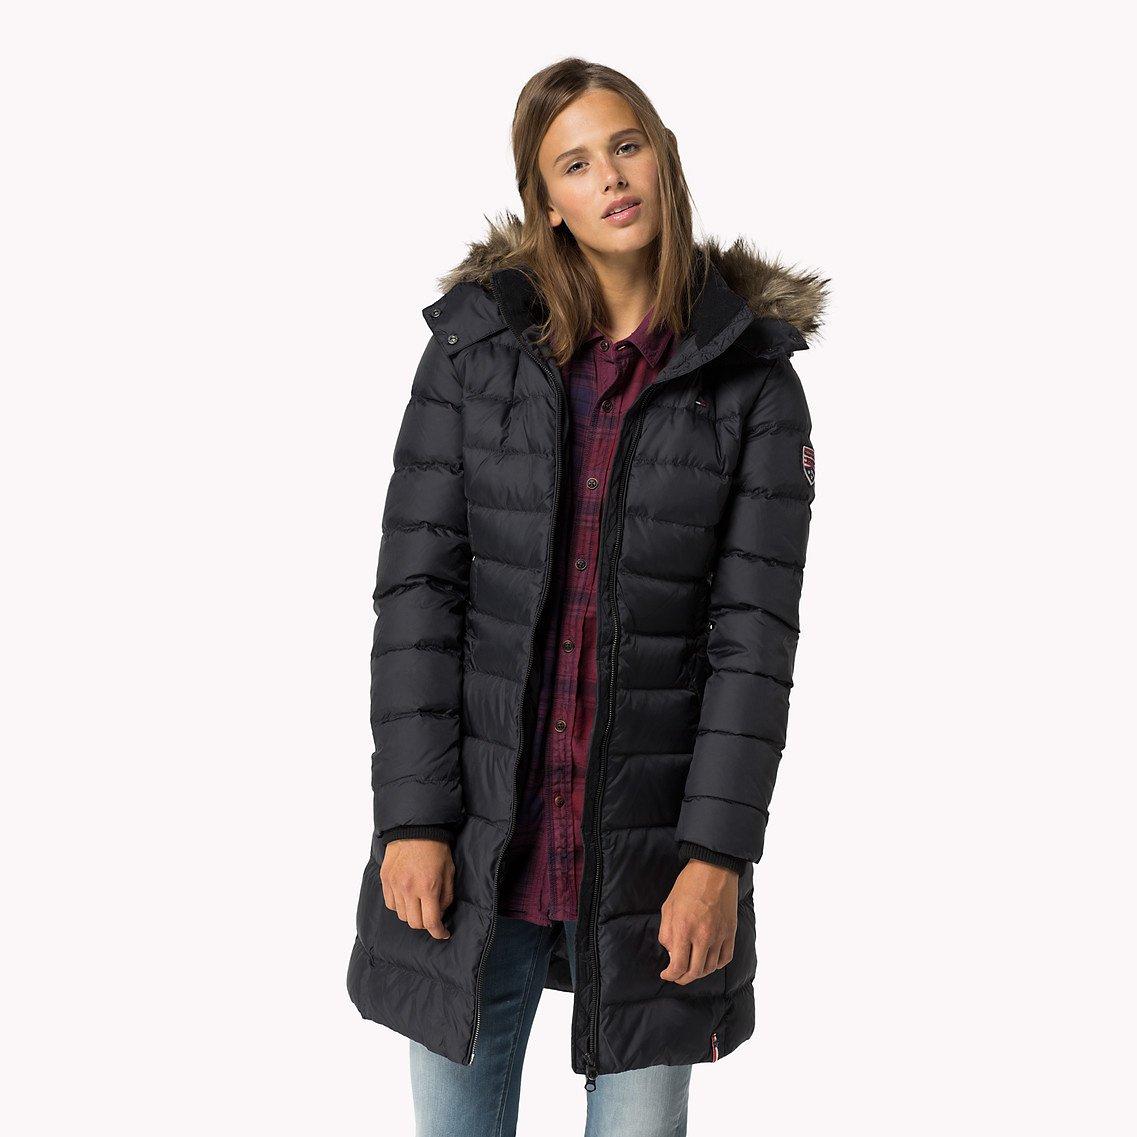 tommy hilfiger women's down filled jacket – Maskbook